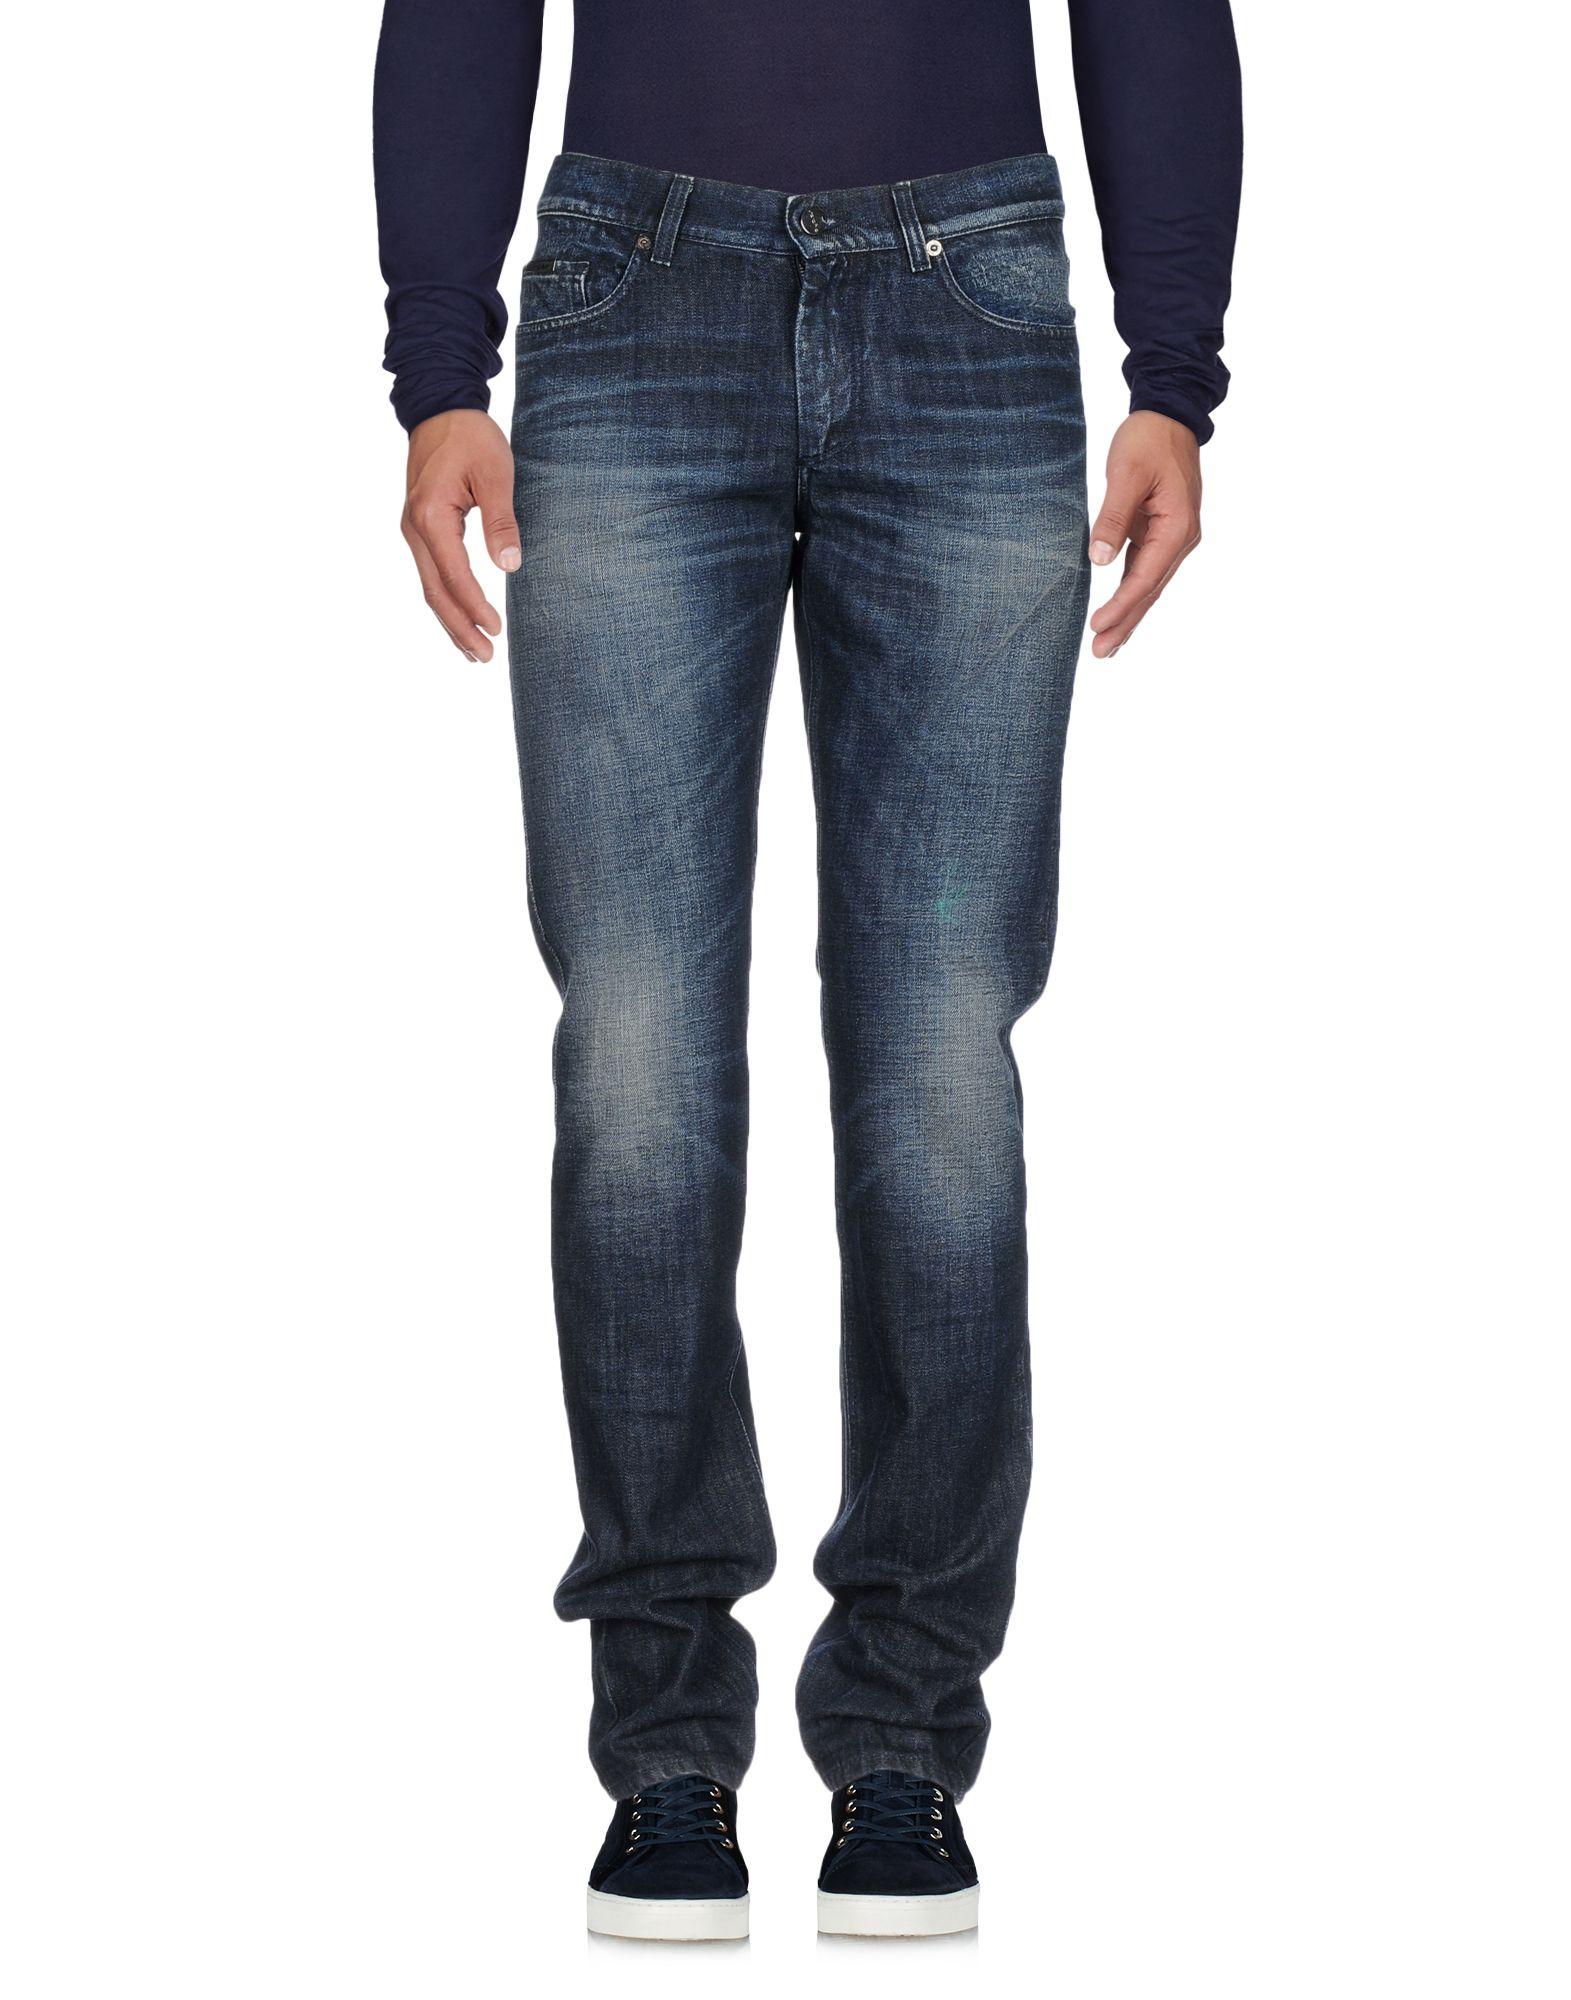 Pantaloni Jeans Byblos Donna - Acquista online su